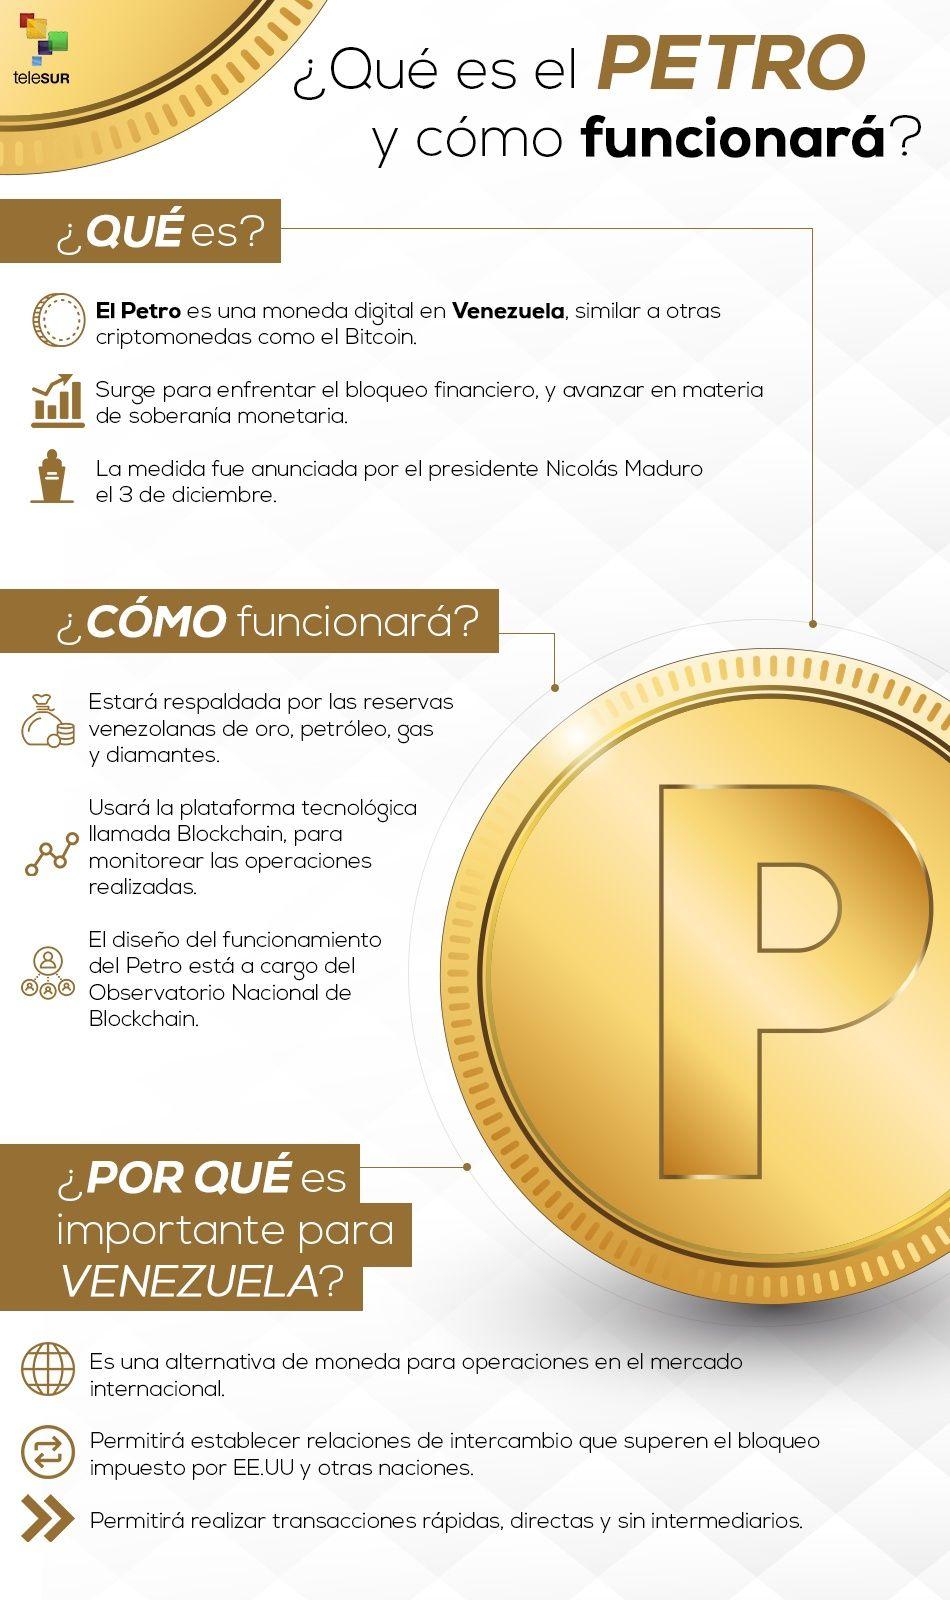 Image Venezuela Petro